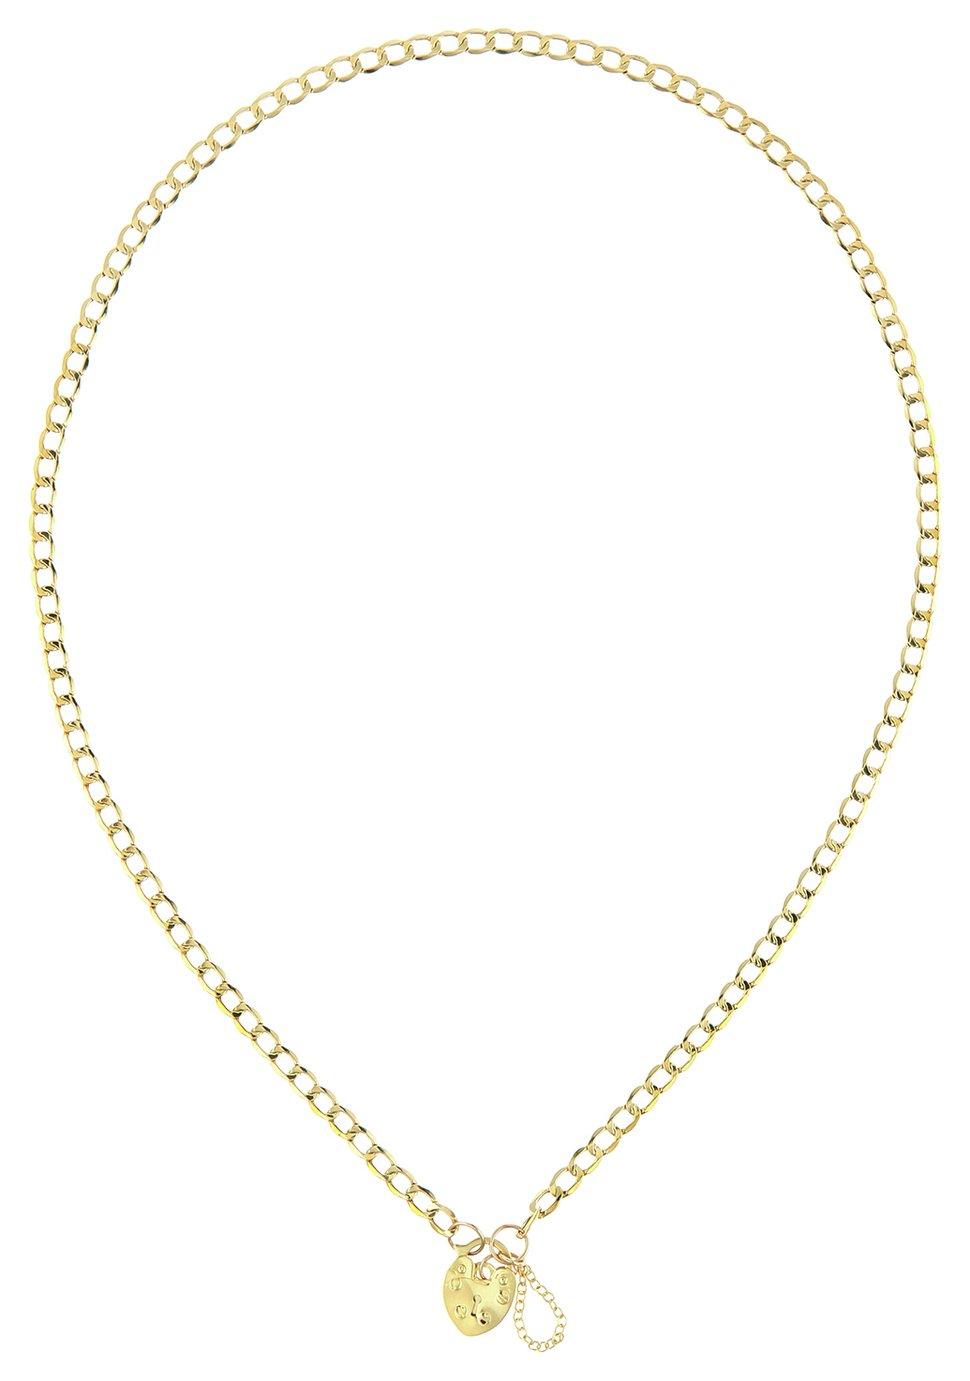 Revere 9ct Gold Heart Padlock Pendant Necklace